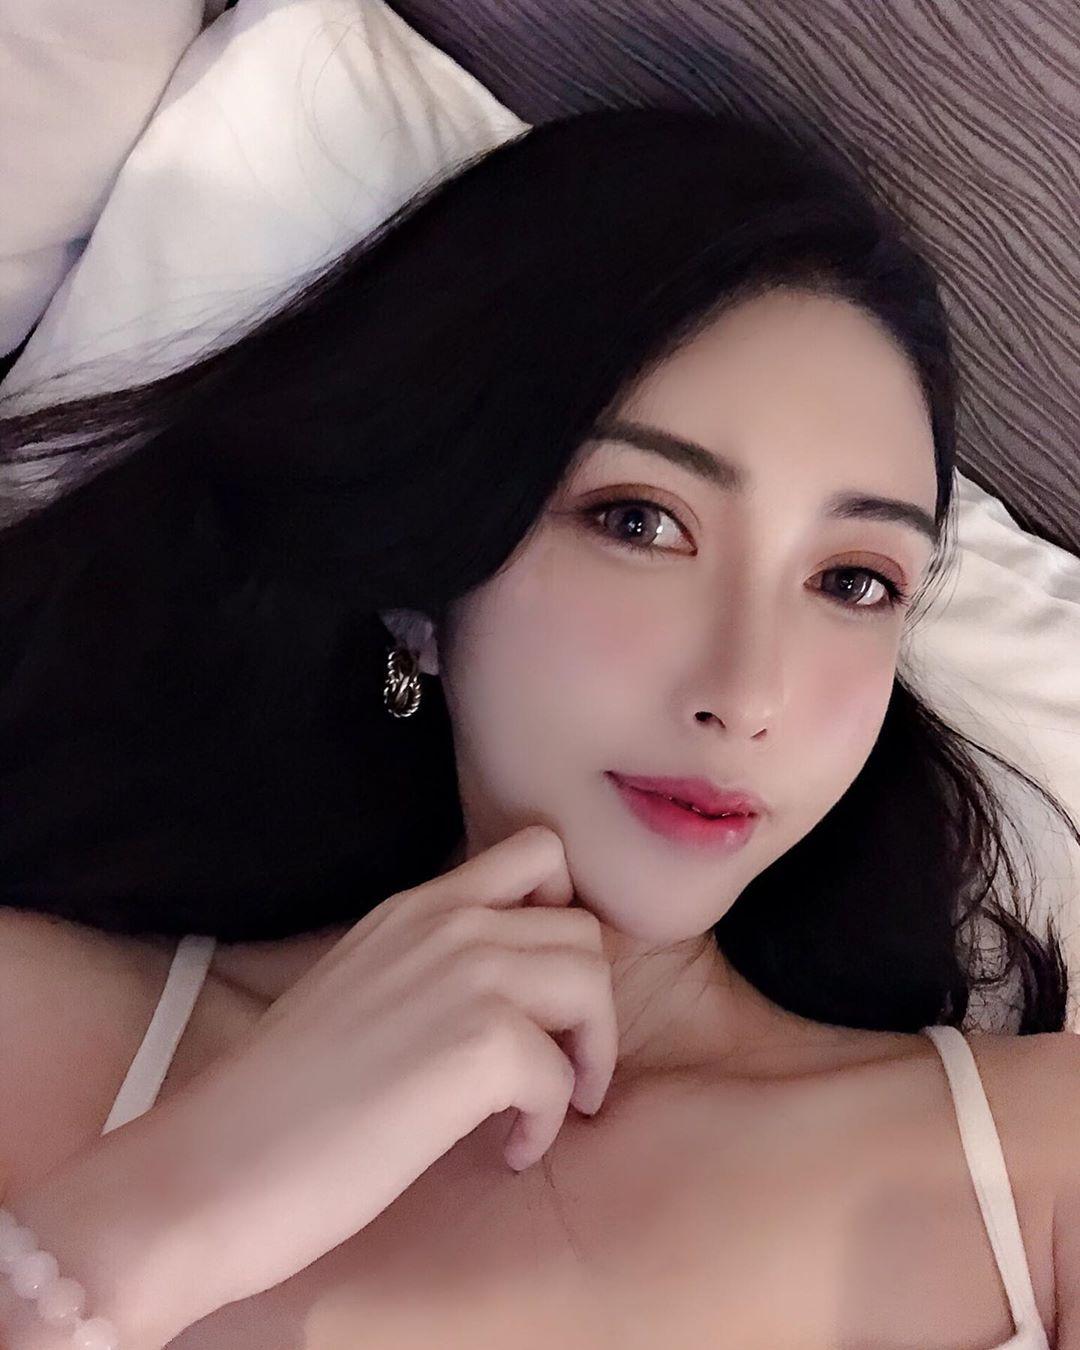 ryx6HTLW o - IG正妹—黃瓊儀